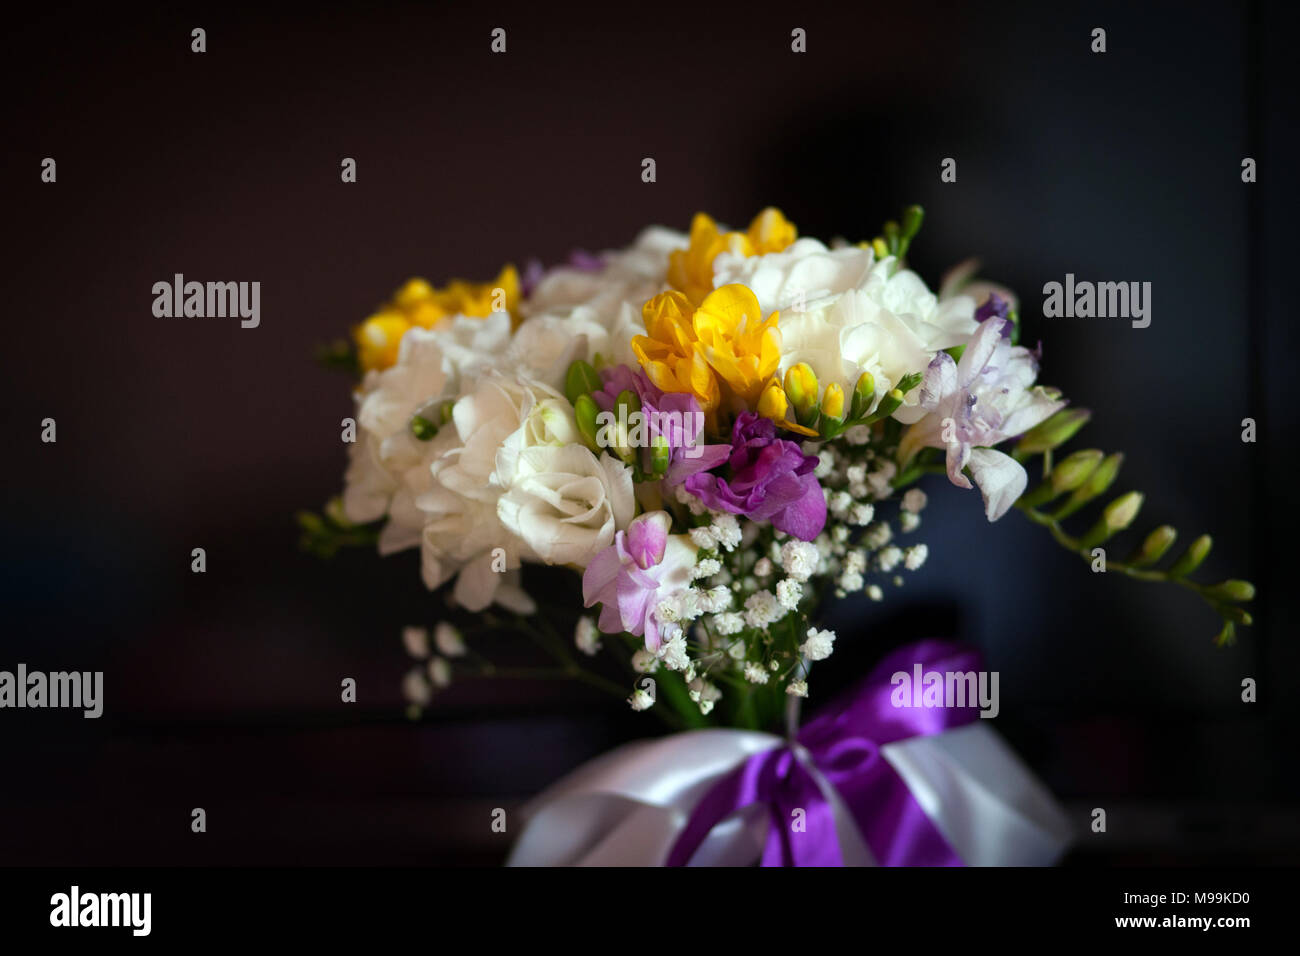 Bouquet of a beautiful colorful freesia flowers stock photo bouquet of a beautiful colorful freesia flowers izmirmasajfo